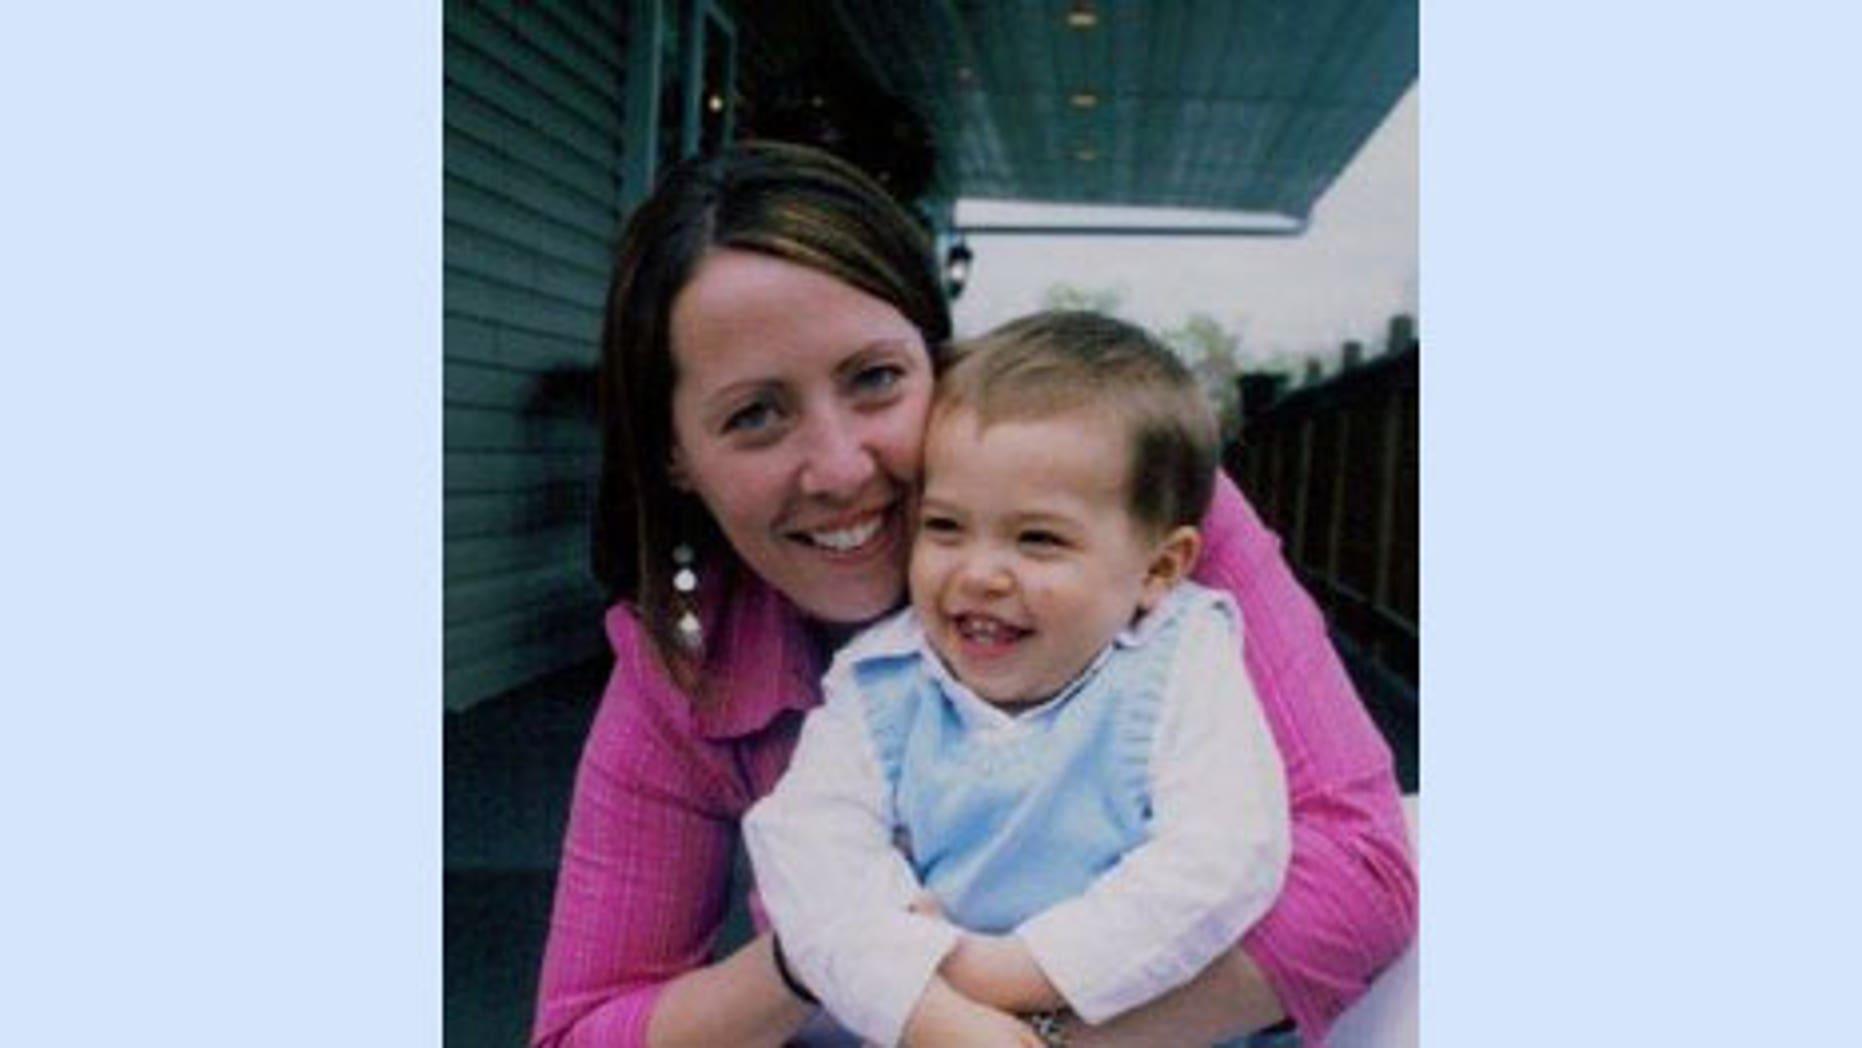 Nichole Mitschele with her son Caleb